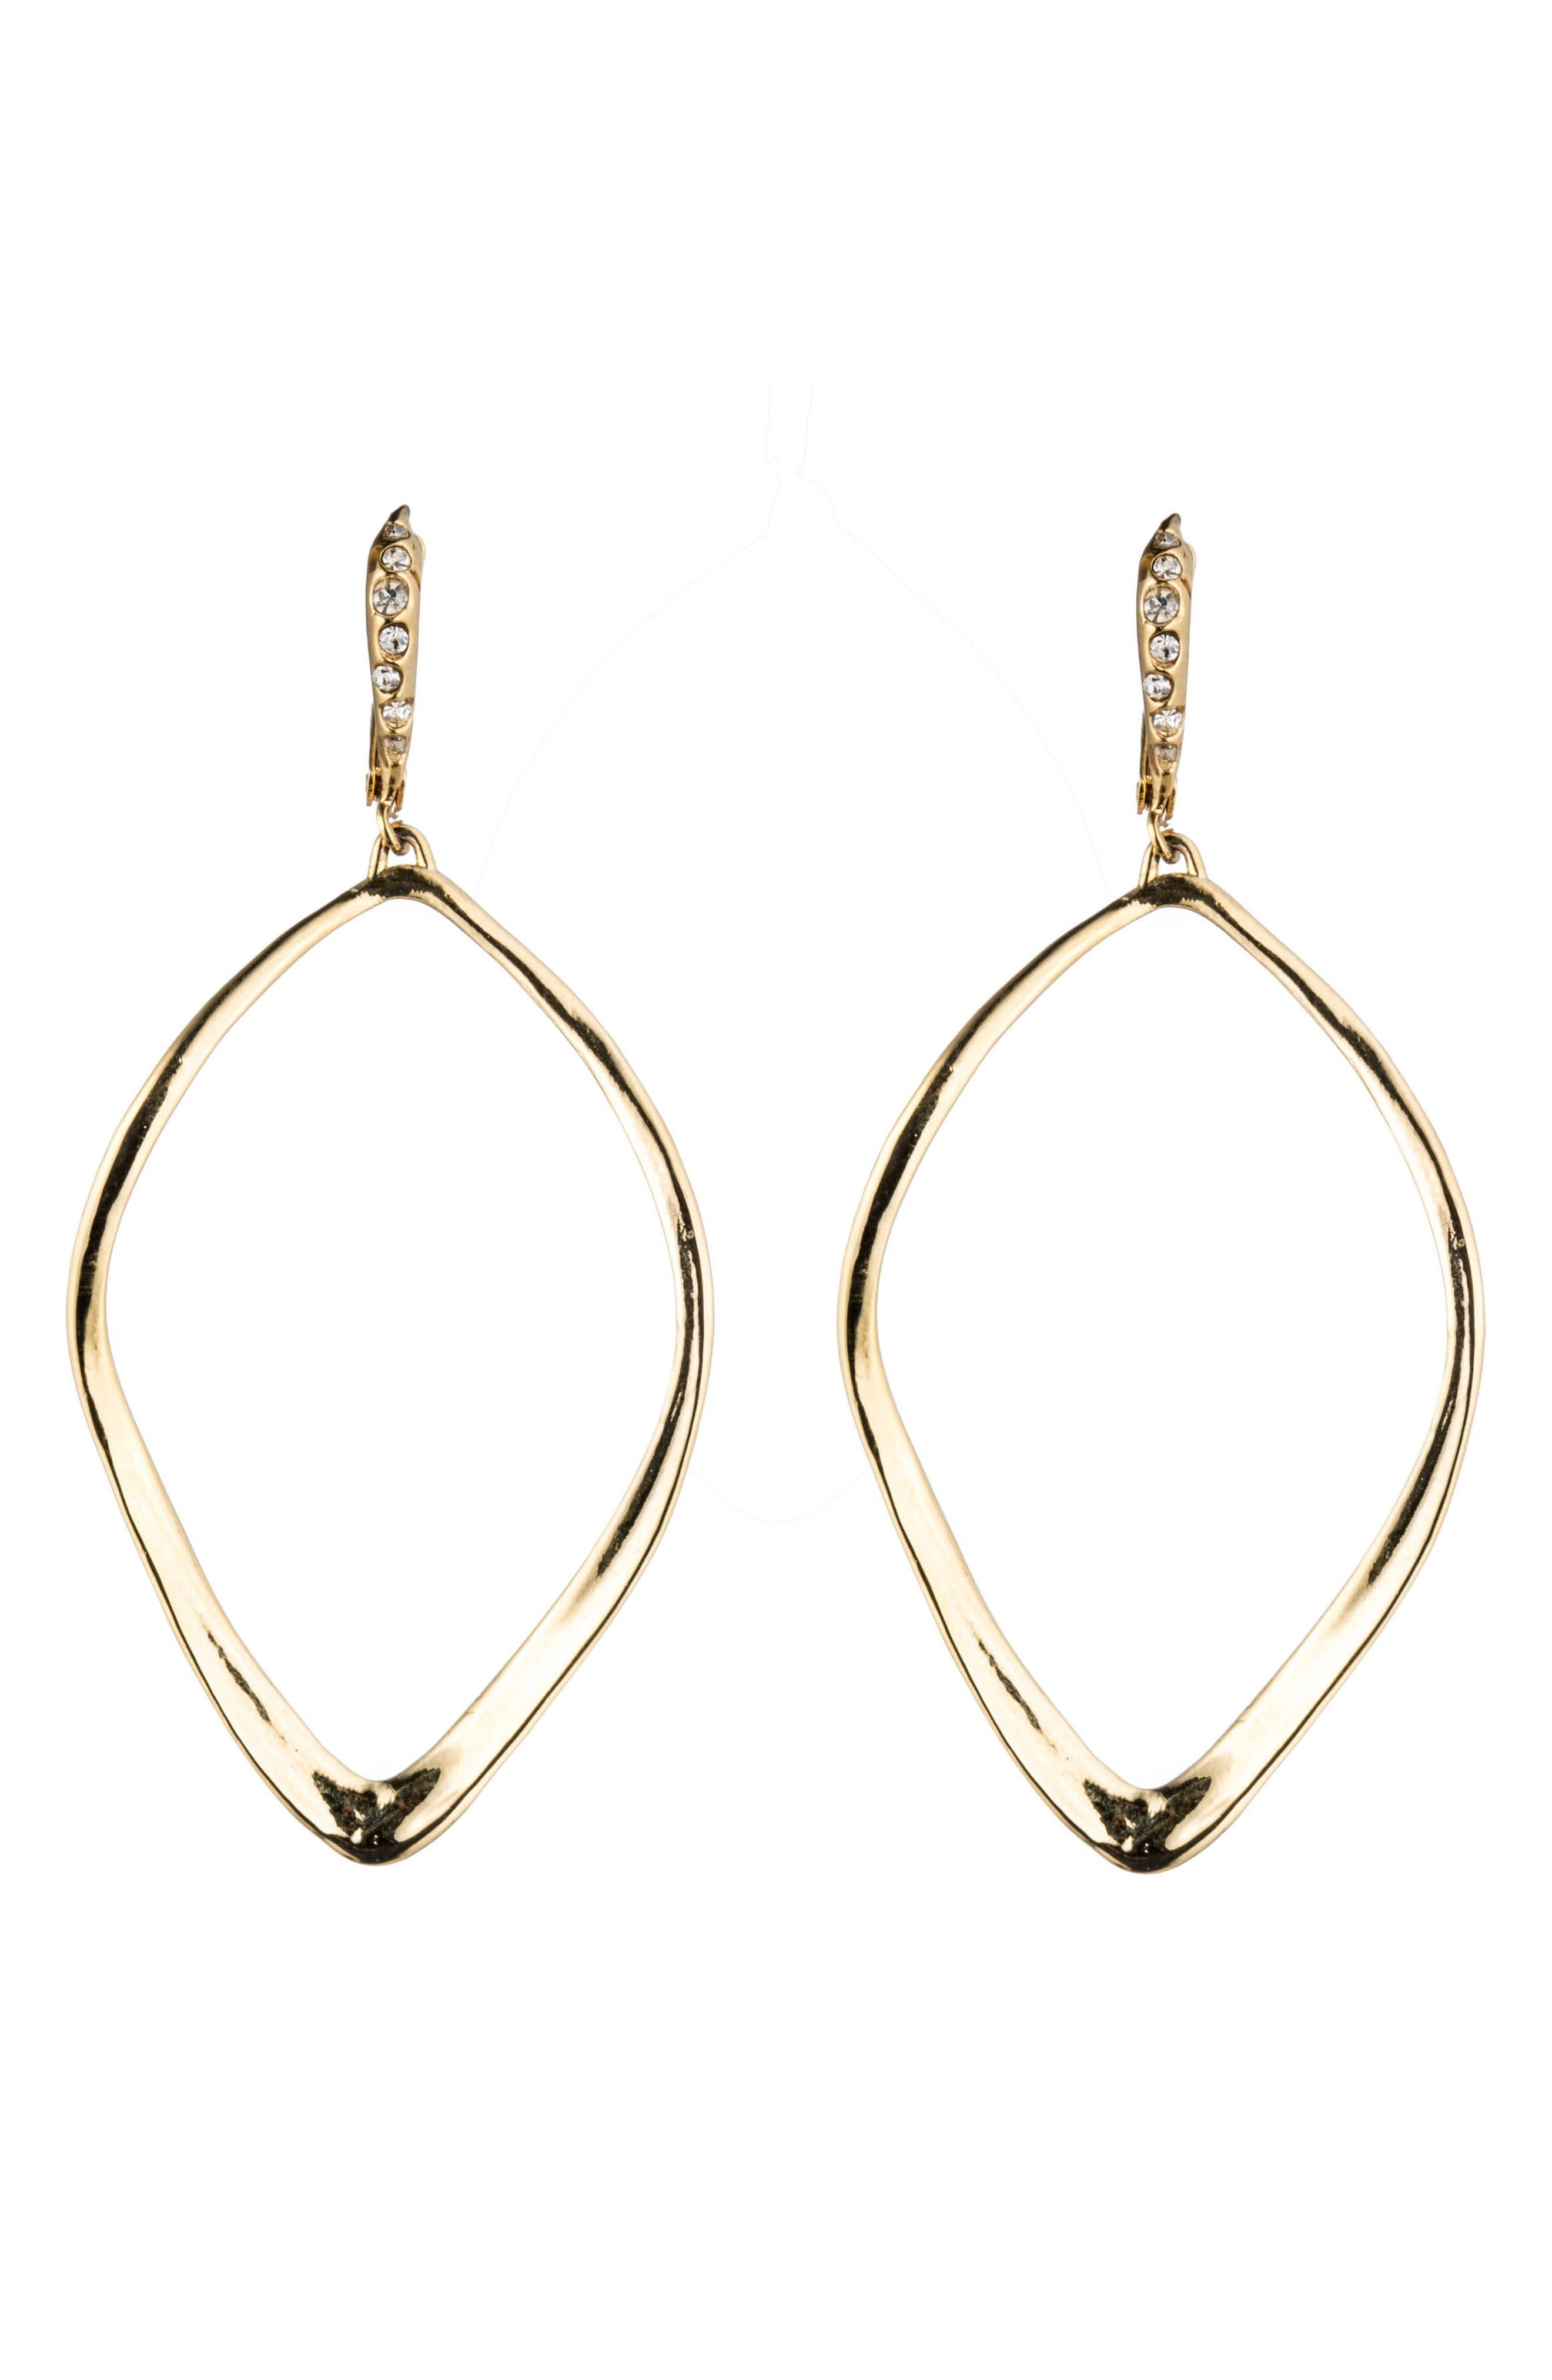 ALEXIS BITTAR 'Miss Havisham' Open Drop Earrings, Main, color, GOLD